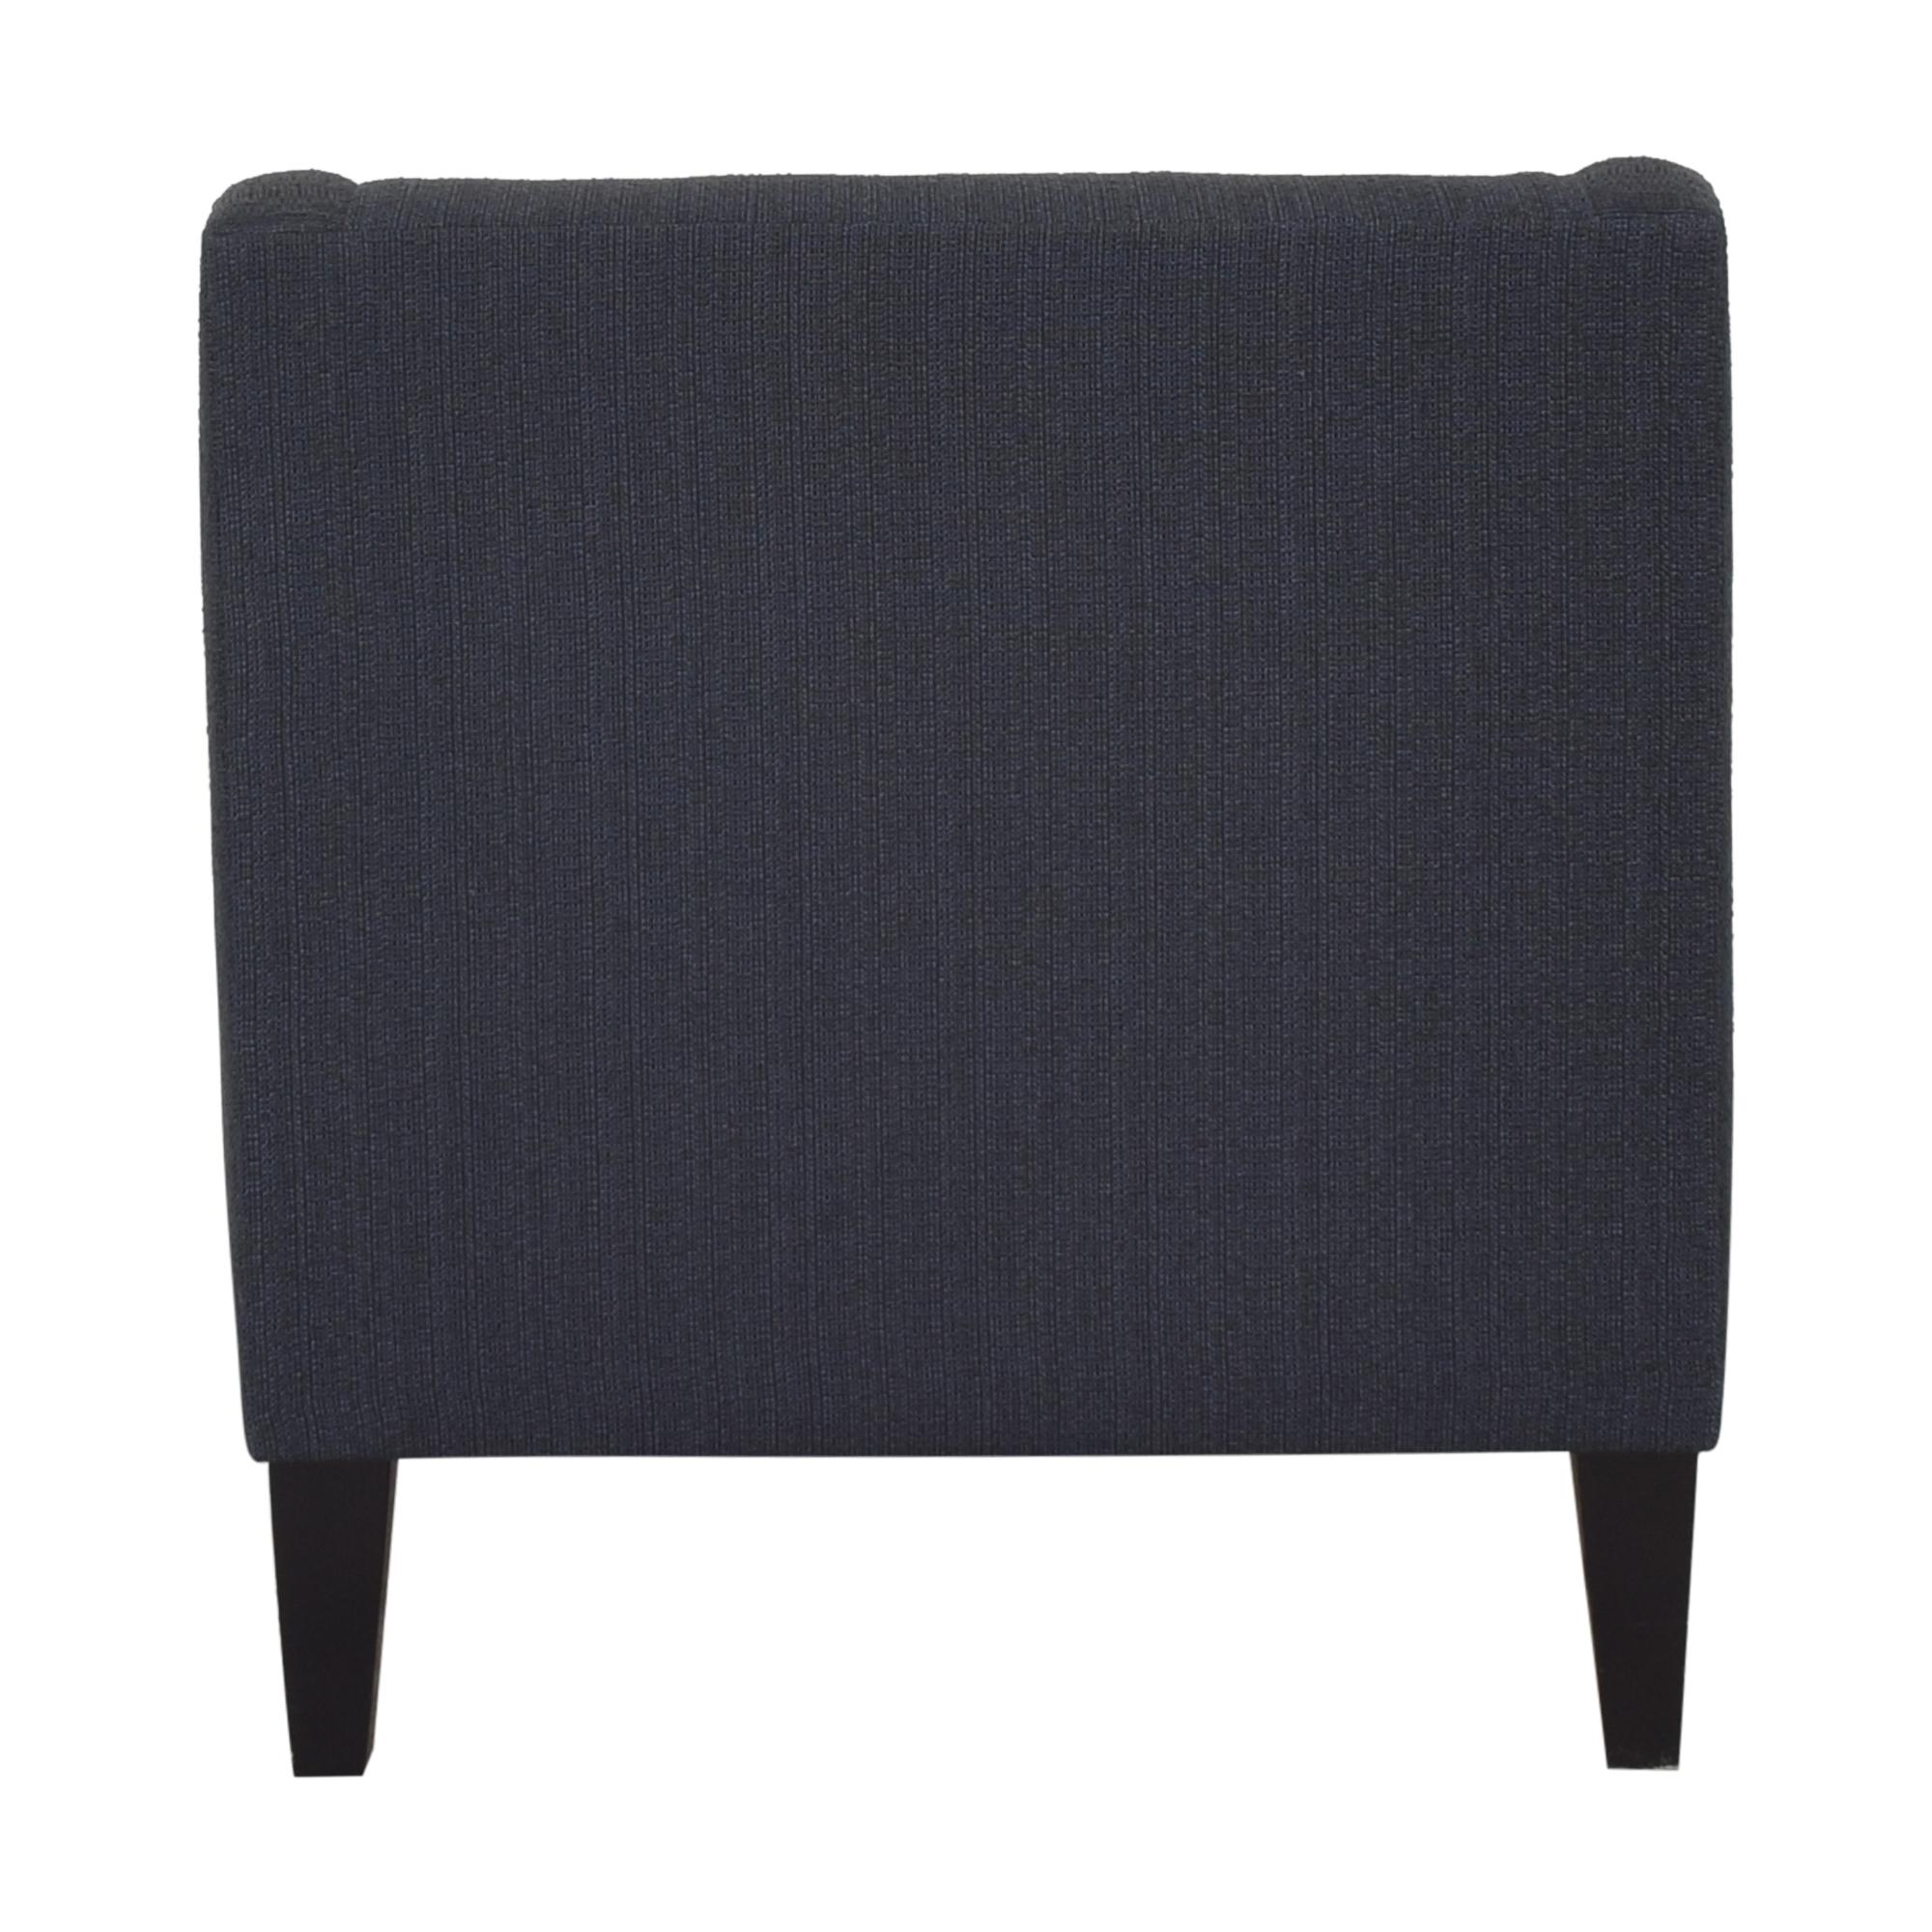 Crate & Barrel Crate & Barrel Margot Chair blue